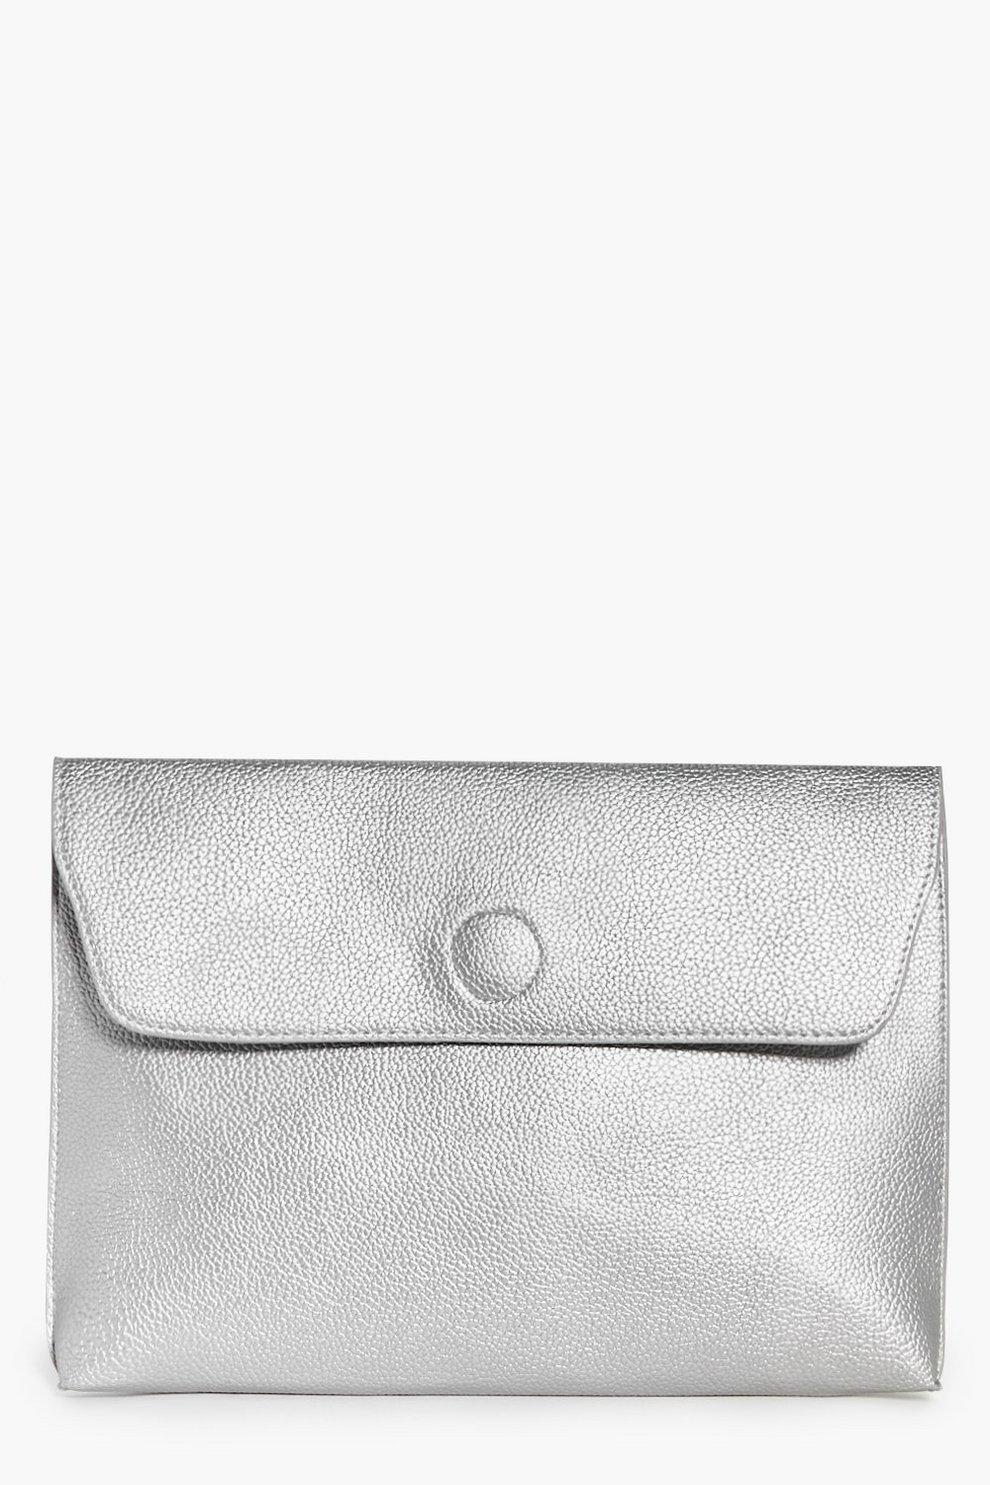 cd88d87a45 Lena Oversized Metallic Clutch Bag | Boohoo